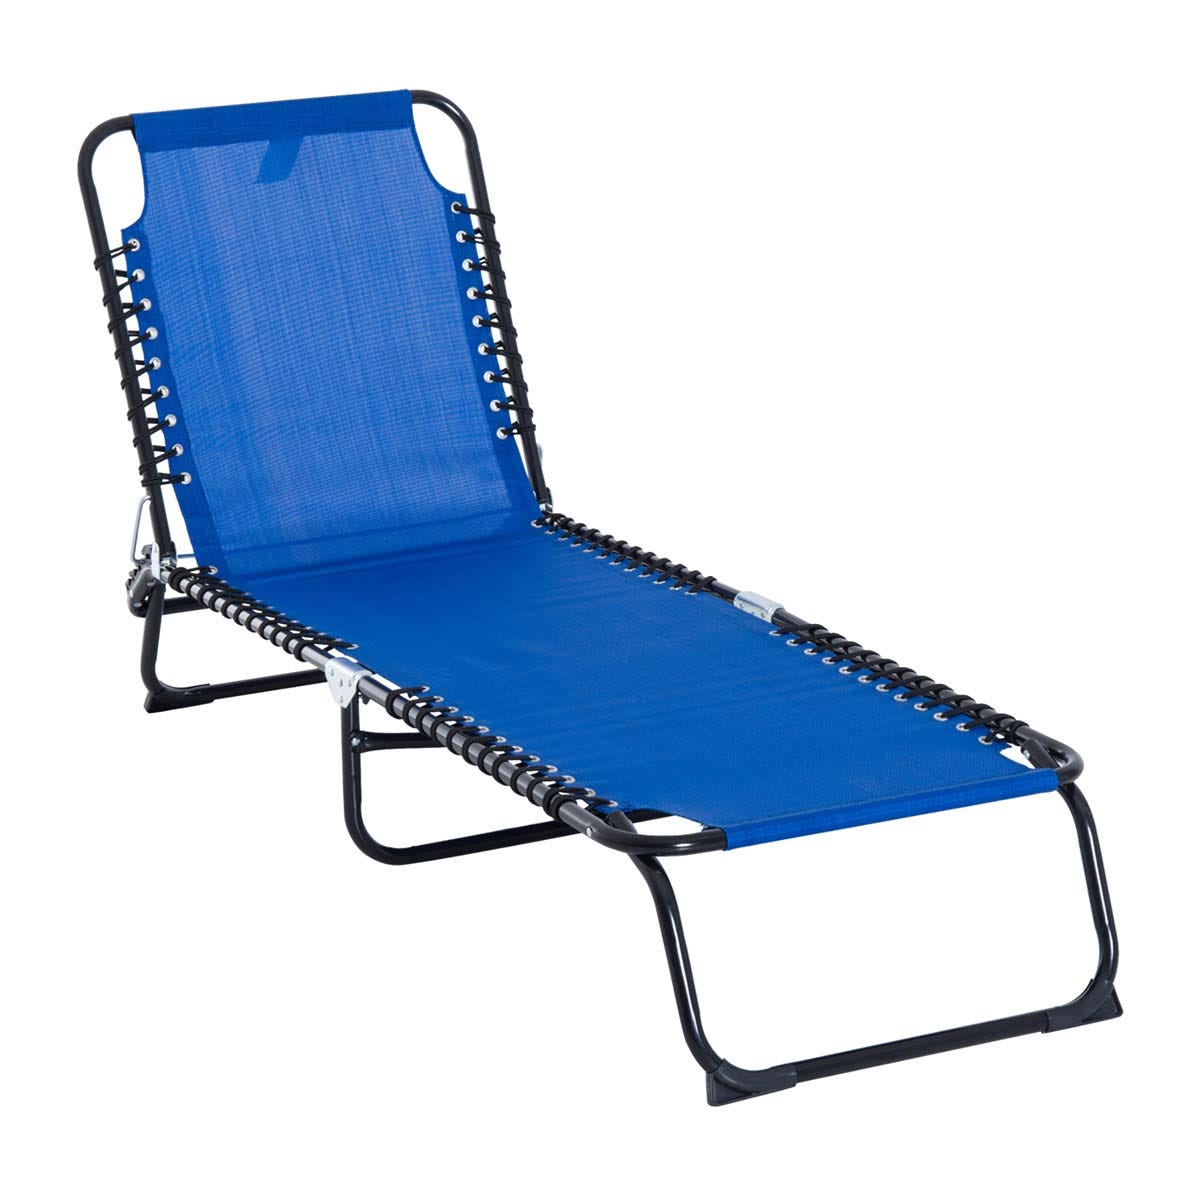 Outsunny Folding Sun Lounger - Blue